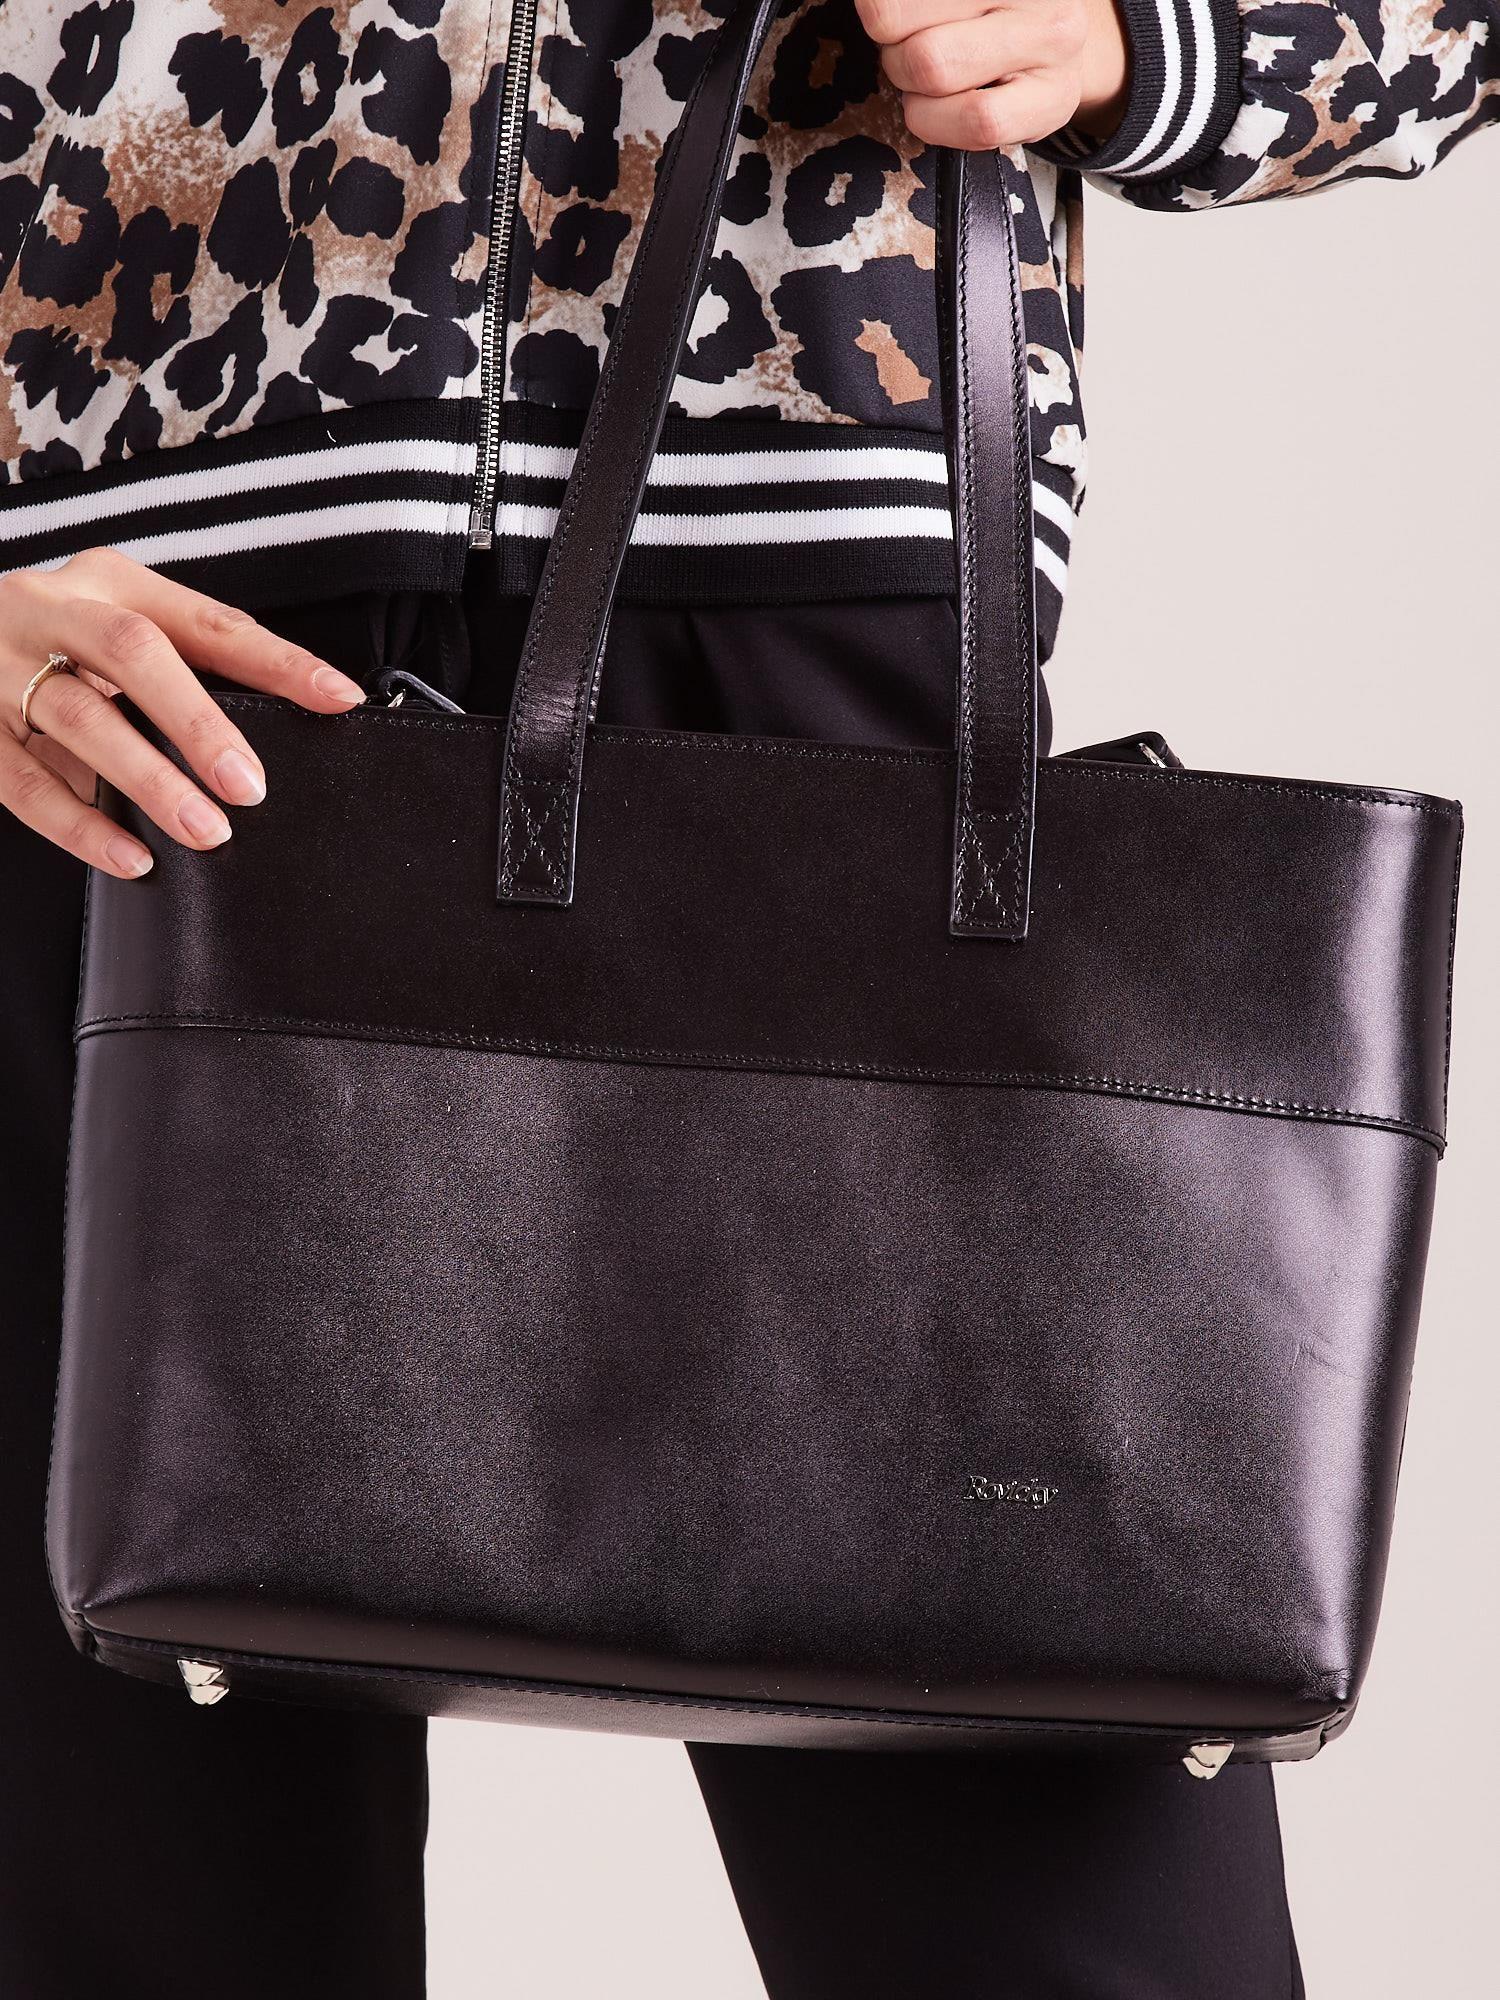 b6acc12ac9ded Czarna skórzana torba shopper bag - Akcesoria torba - sklep eButik.pl